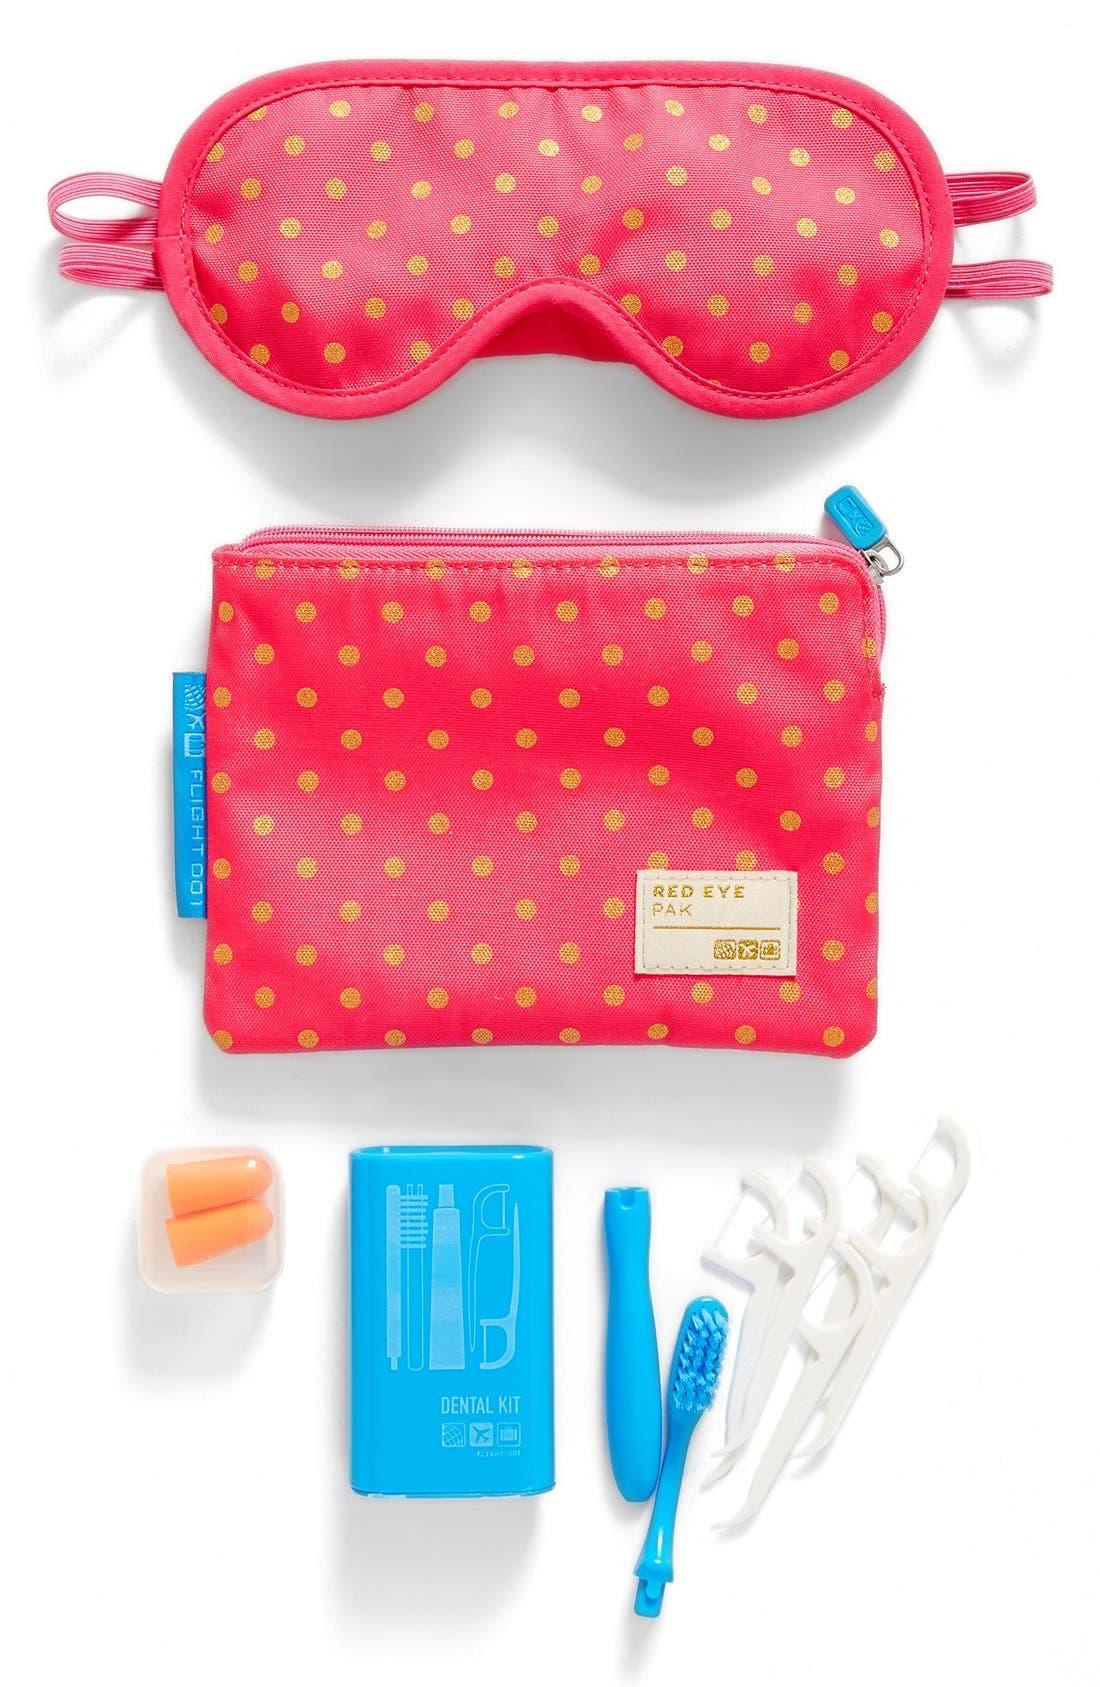 Red Eye Kit, Main, color, 651